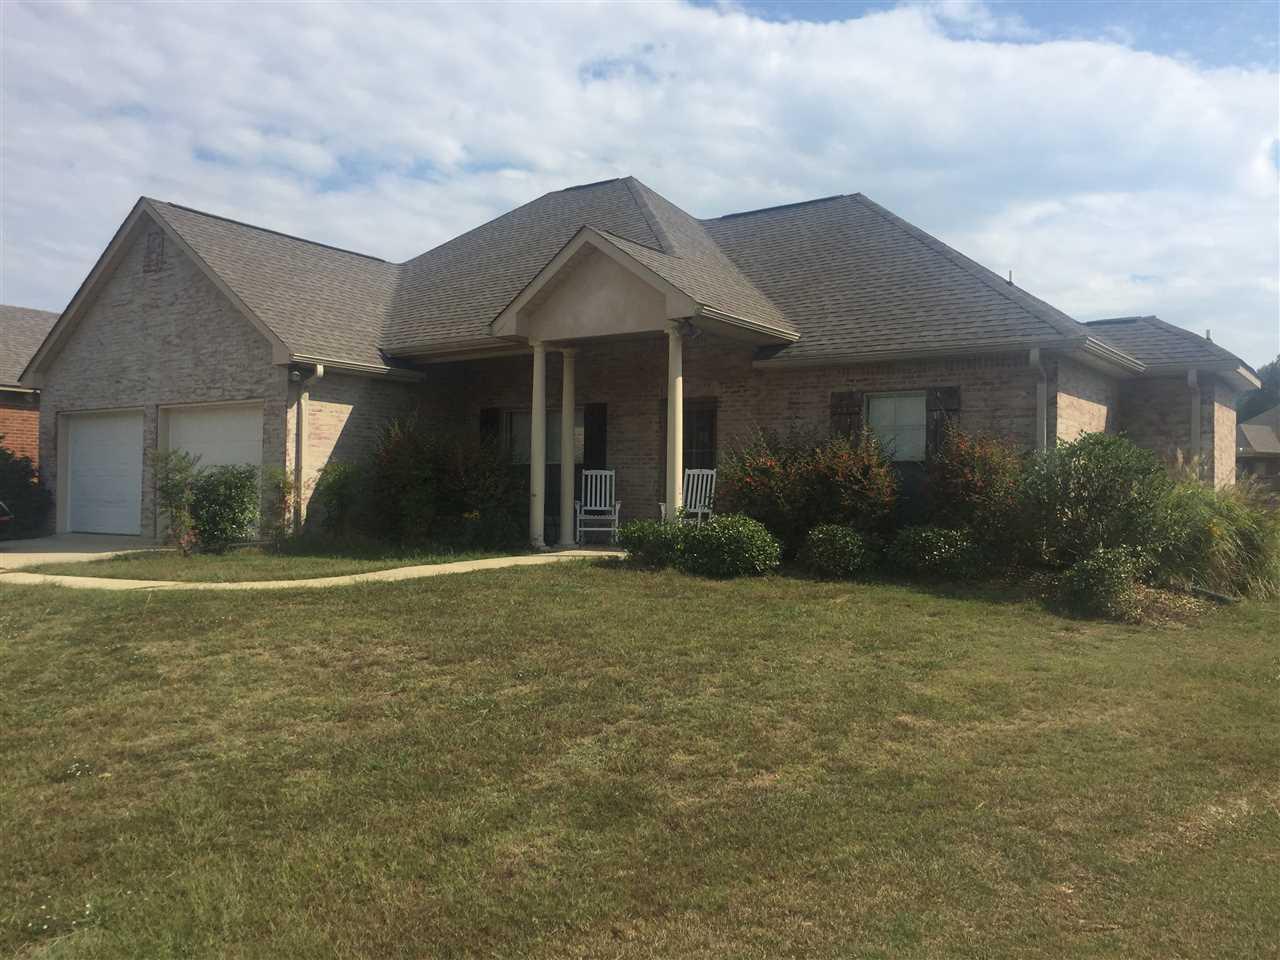 Rental Homes for Rent, ListingId:35670846, location: 107 RICHMOND WAY Canton 39046